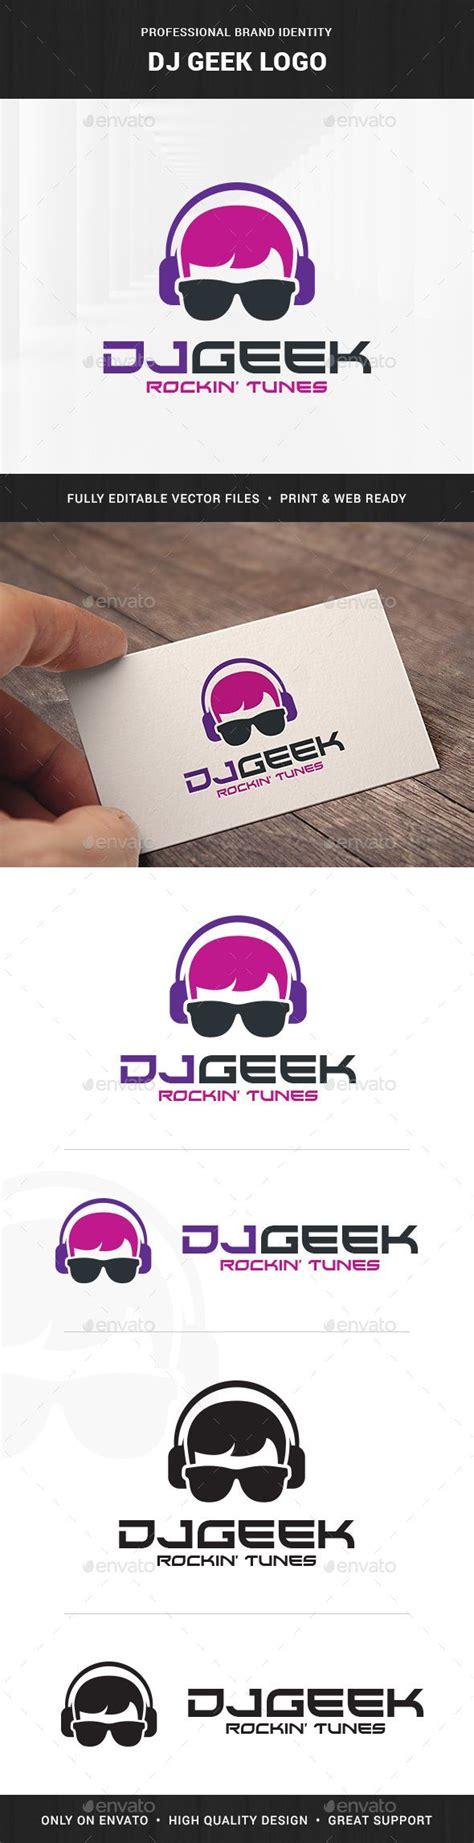 dj logo photoshop template best 25 dj logo ideas on pinterest music logo sound